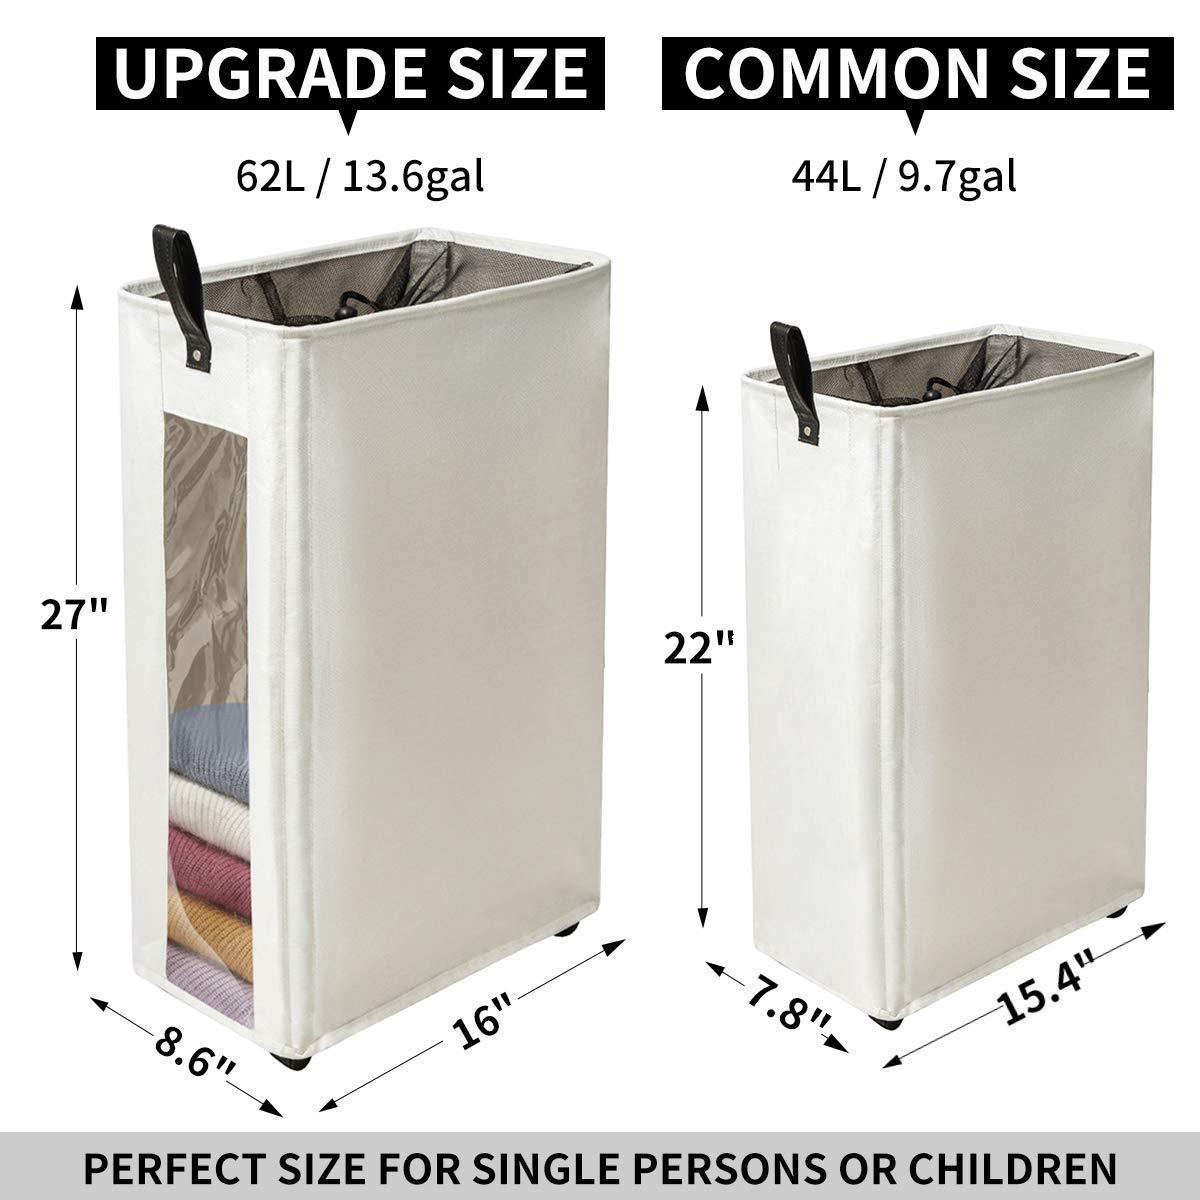 ZERO JET LAG Slim Laundry Hamper Tall Laundry Basket Clear Window Fabric Laundry Bin on Wheels Corner Handy Waterproof Bathroom 16\